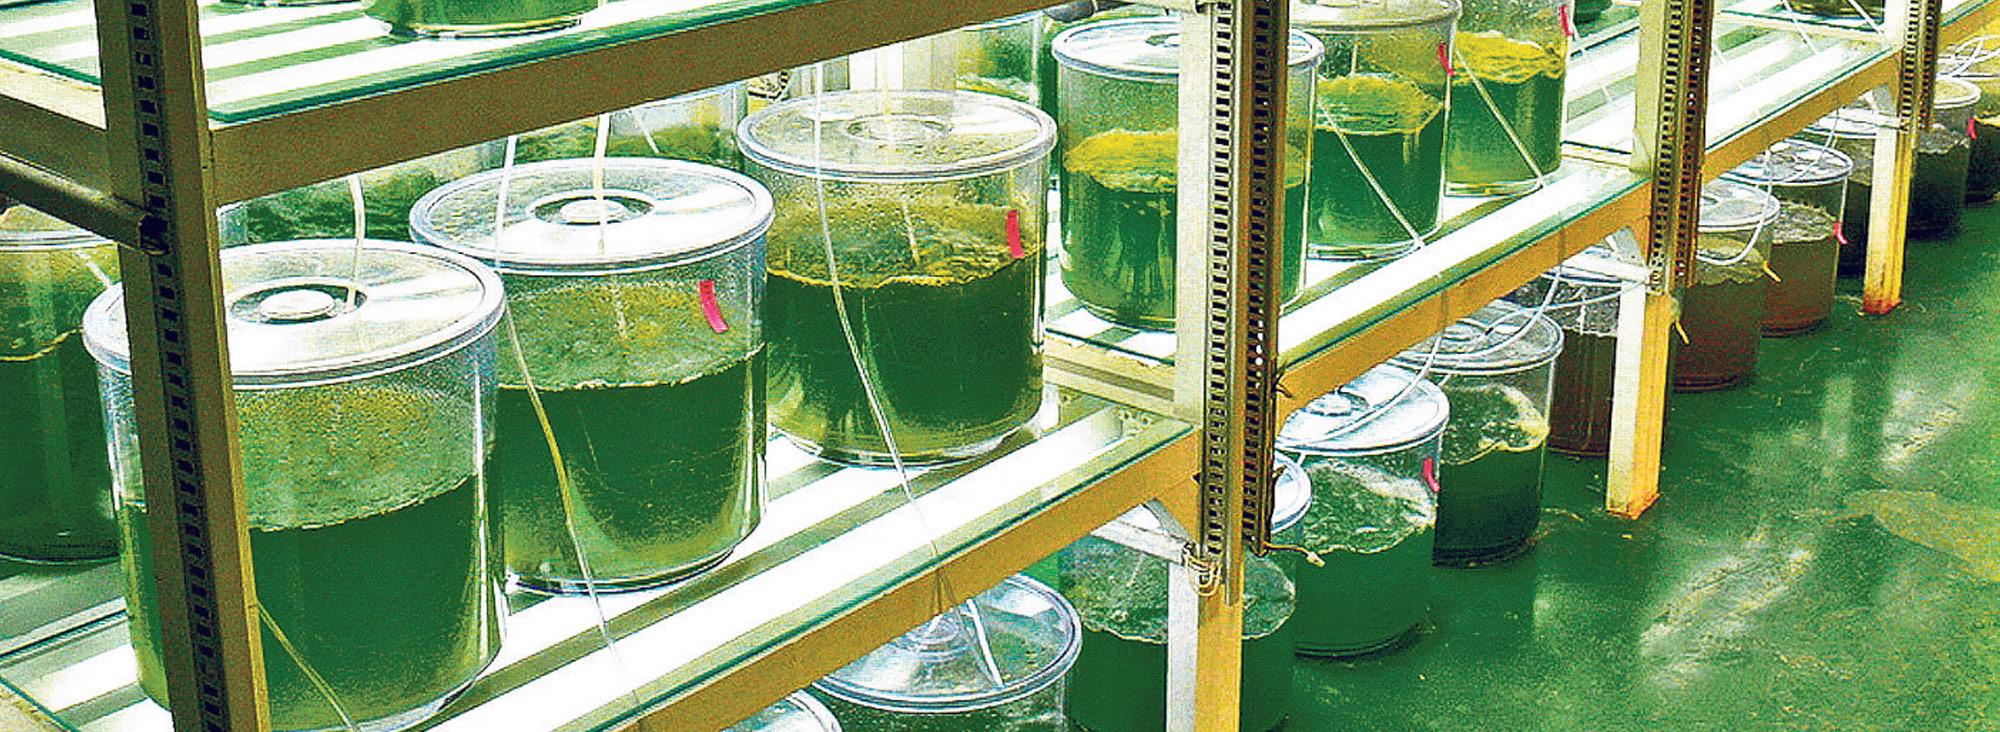 Algas biocombustibles